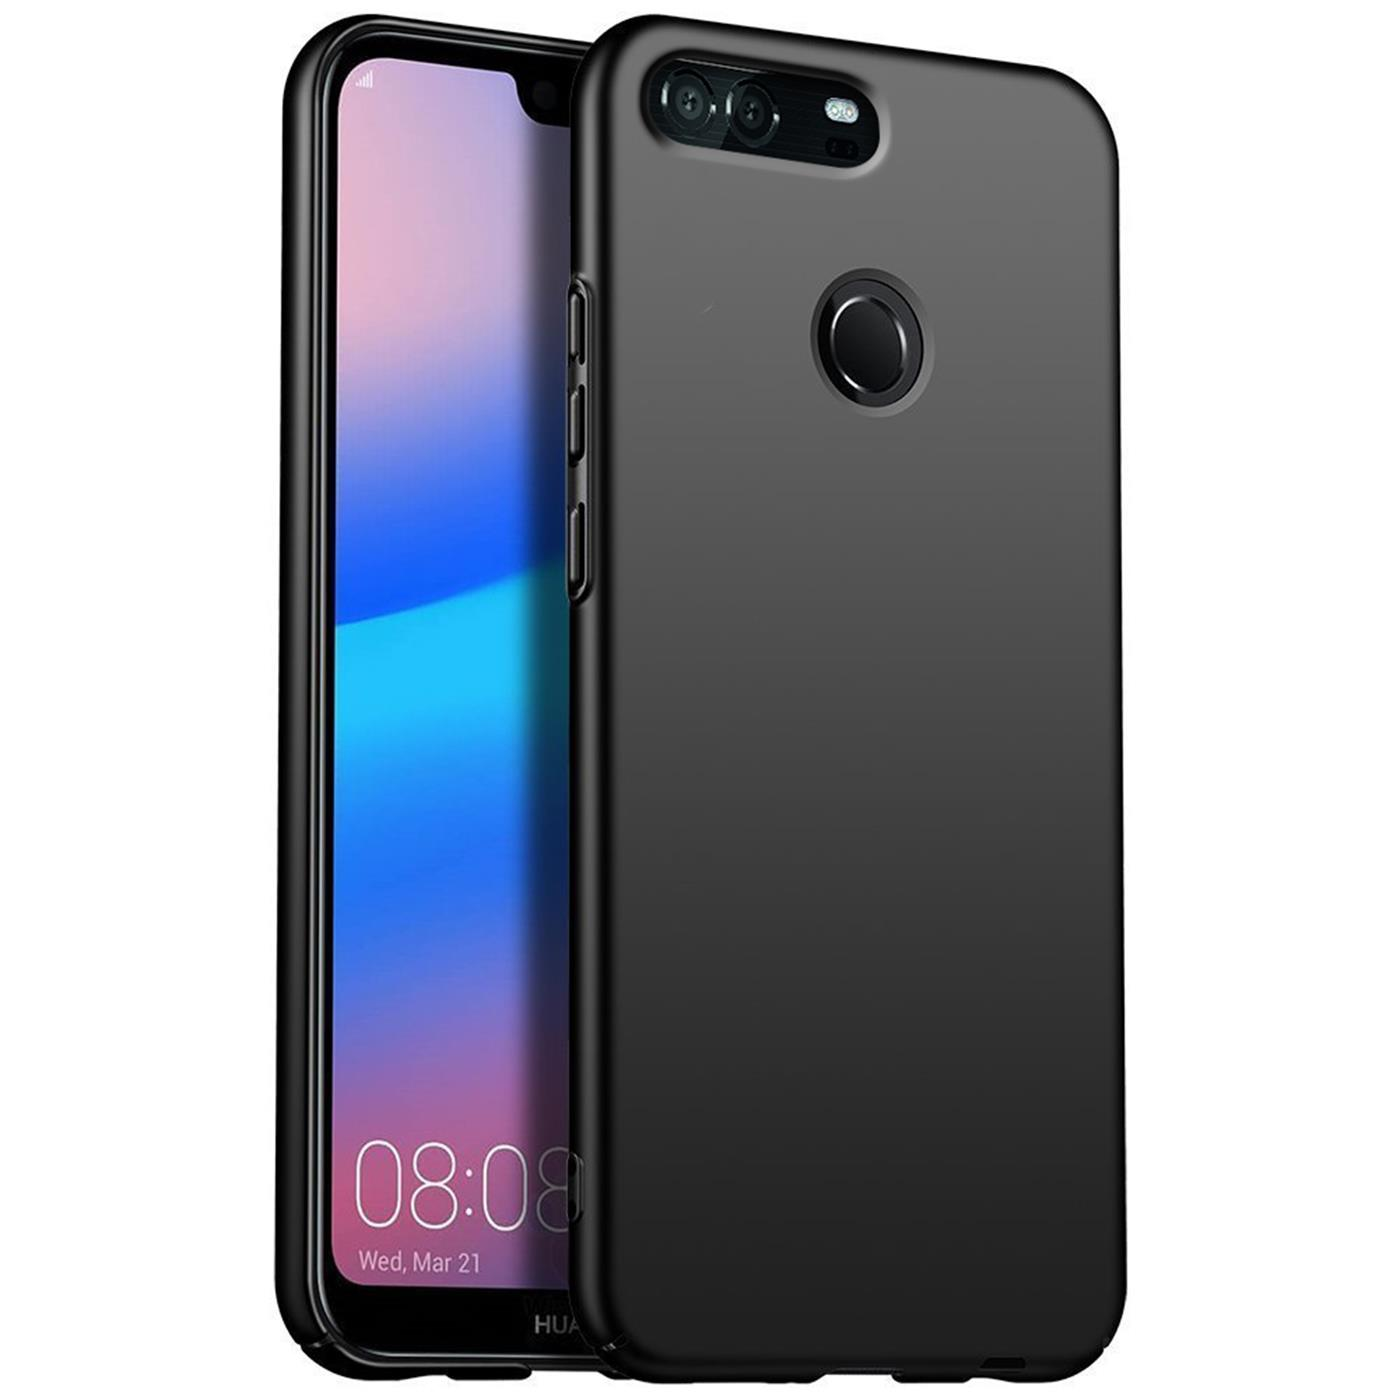 Hard-Back-Case-Cover-Huawei-p10-duenn-Cover-Slim-Shockproof-Rugged Indexbild 6